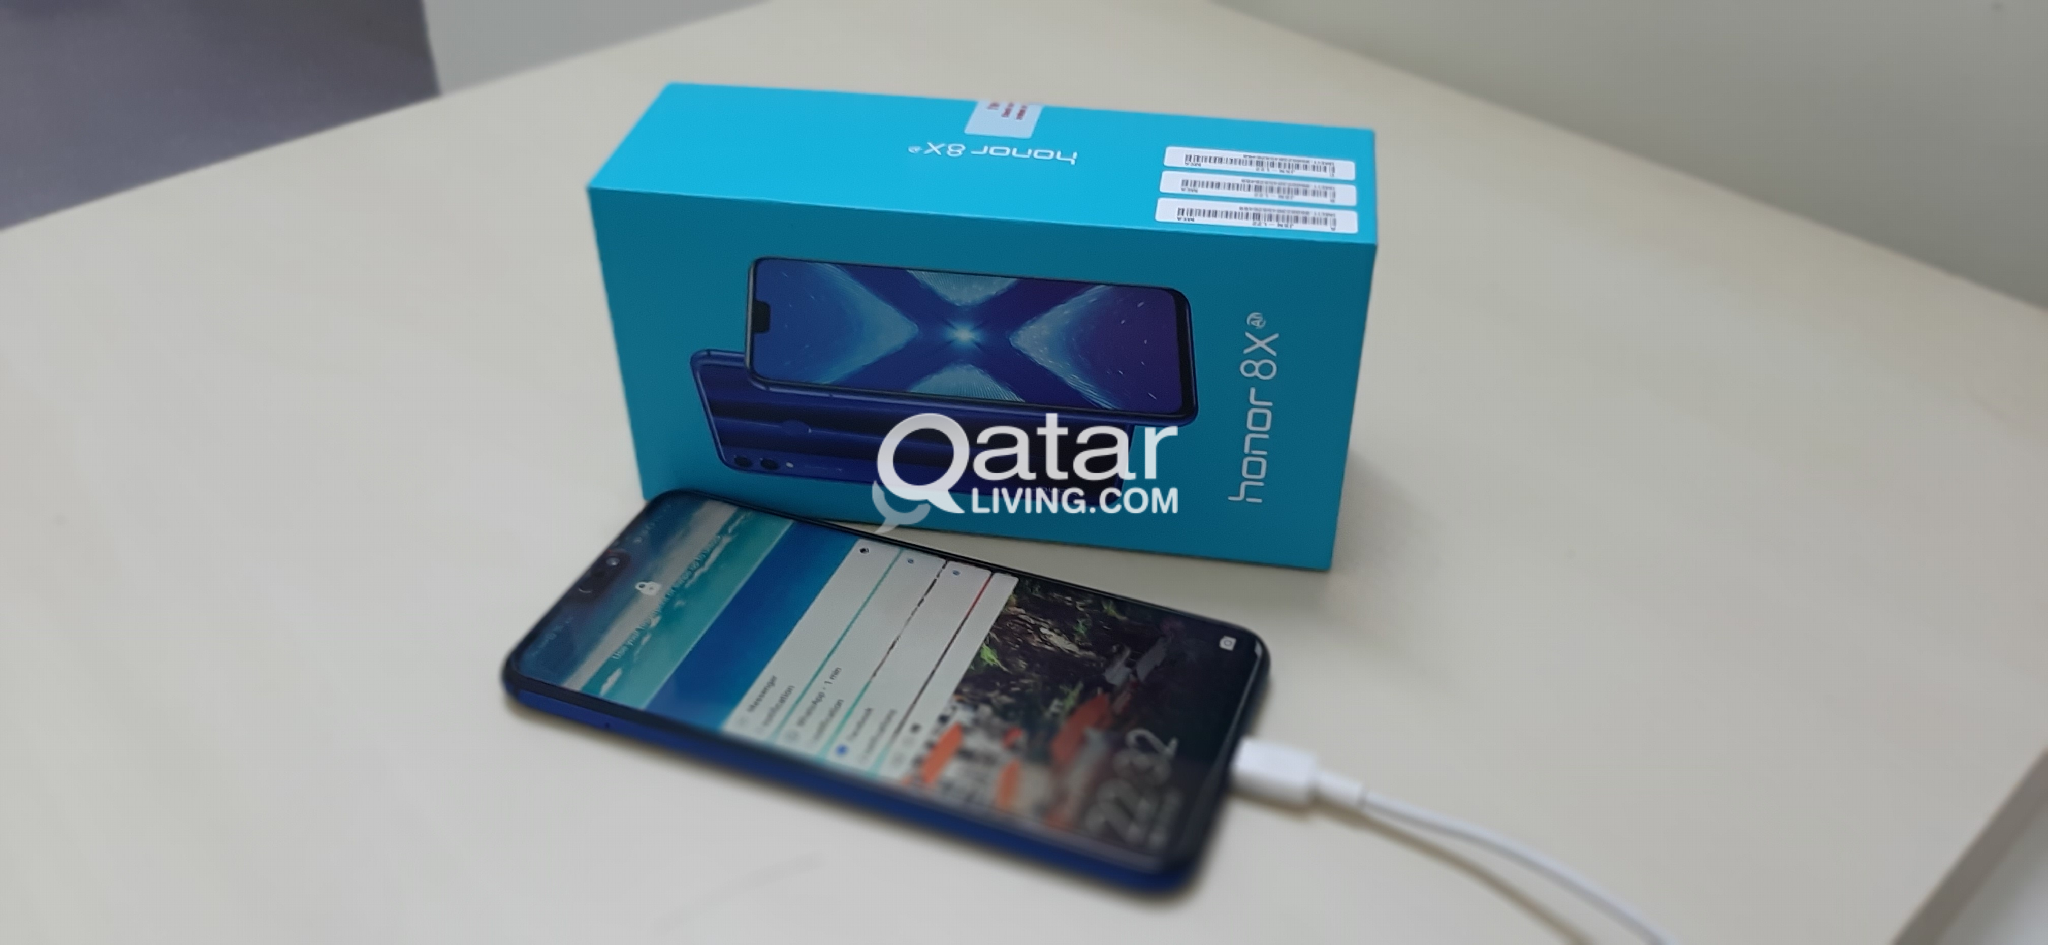 honor 8x , like new need some maintenance | Qatar Living